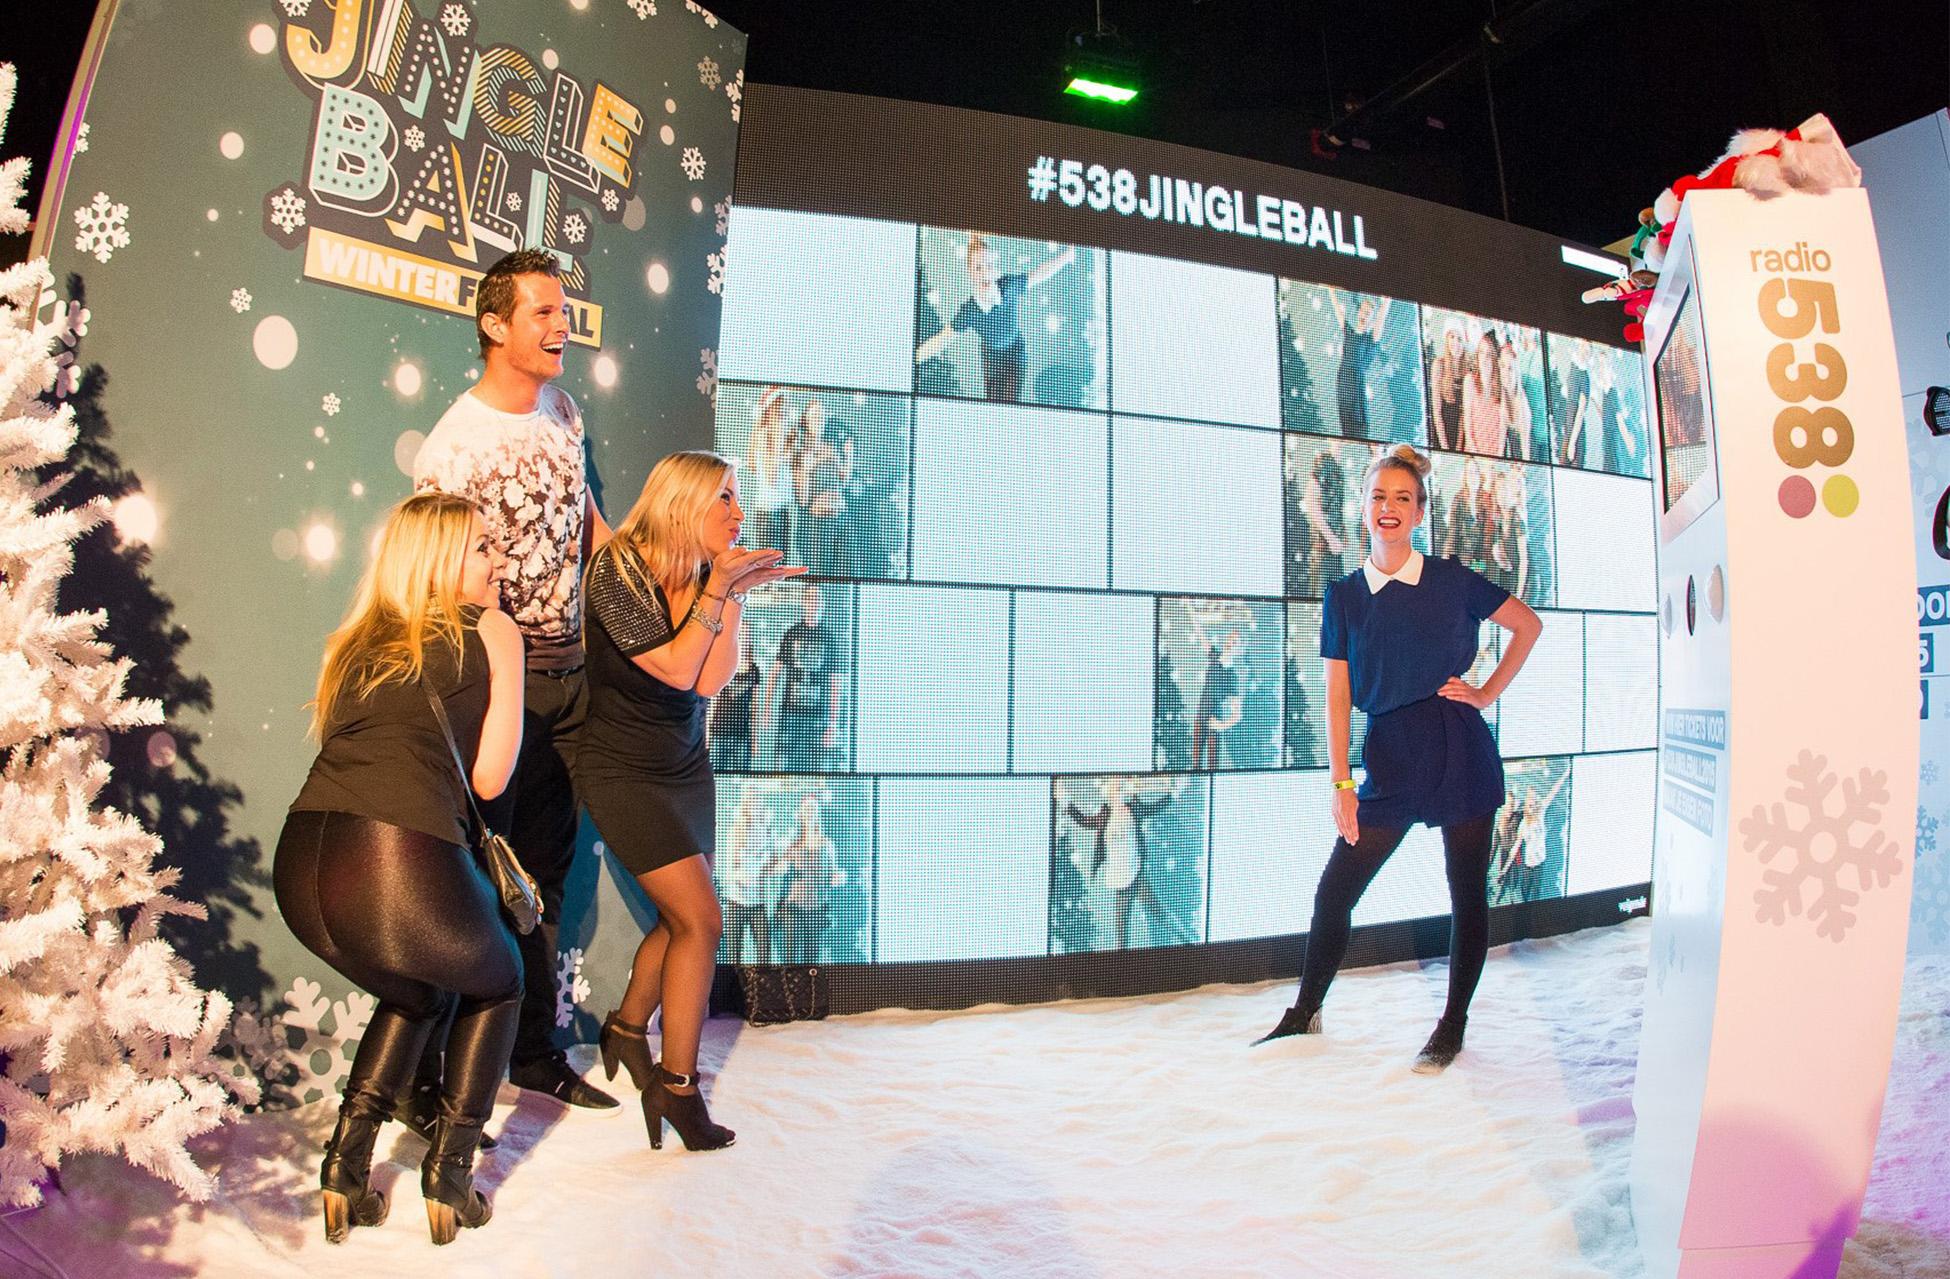 Radio 538 - Hostesses - Jingle Ball - Ziggo Dome - PhotoBooth